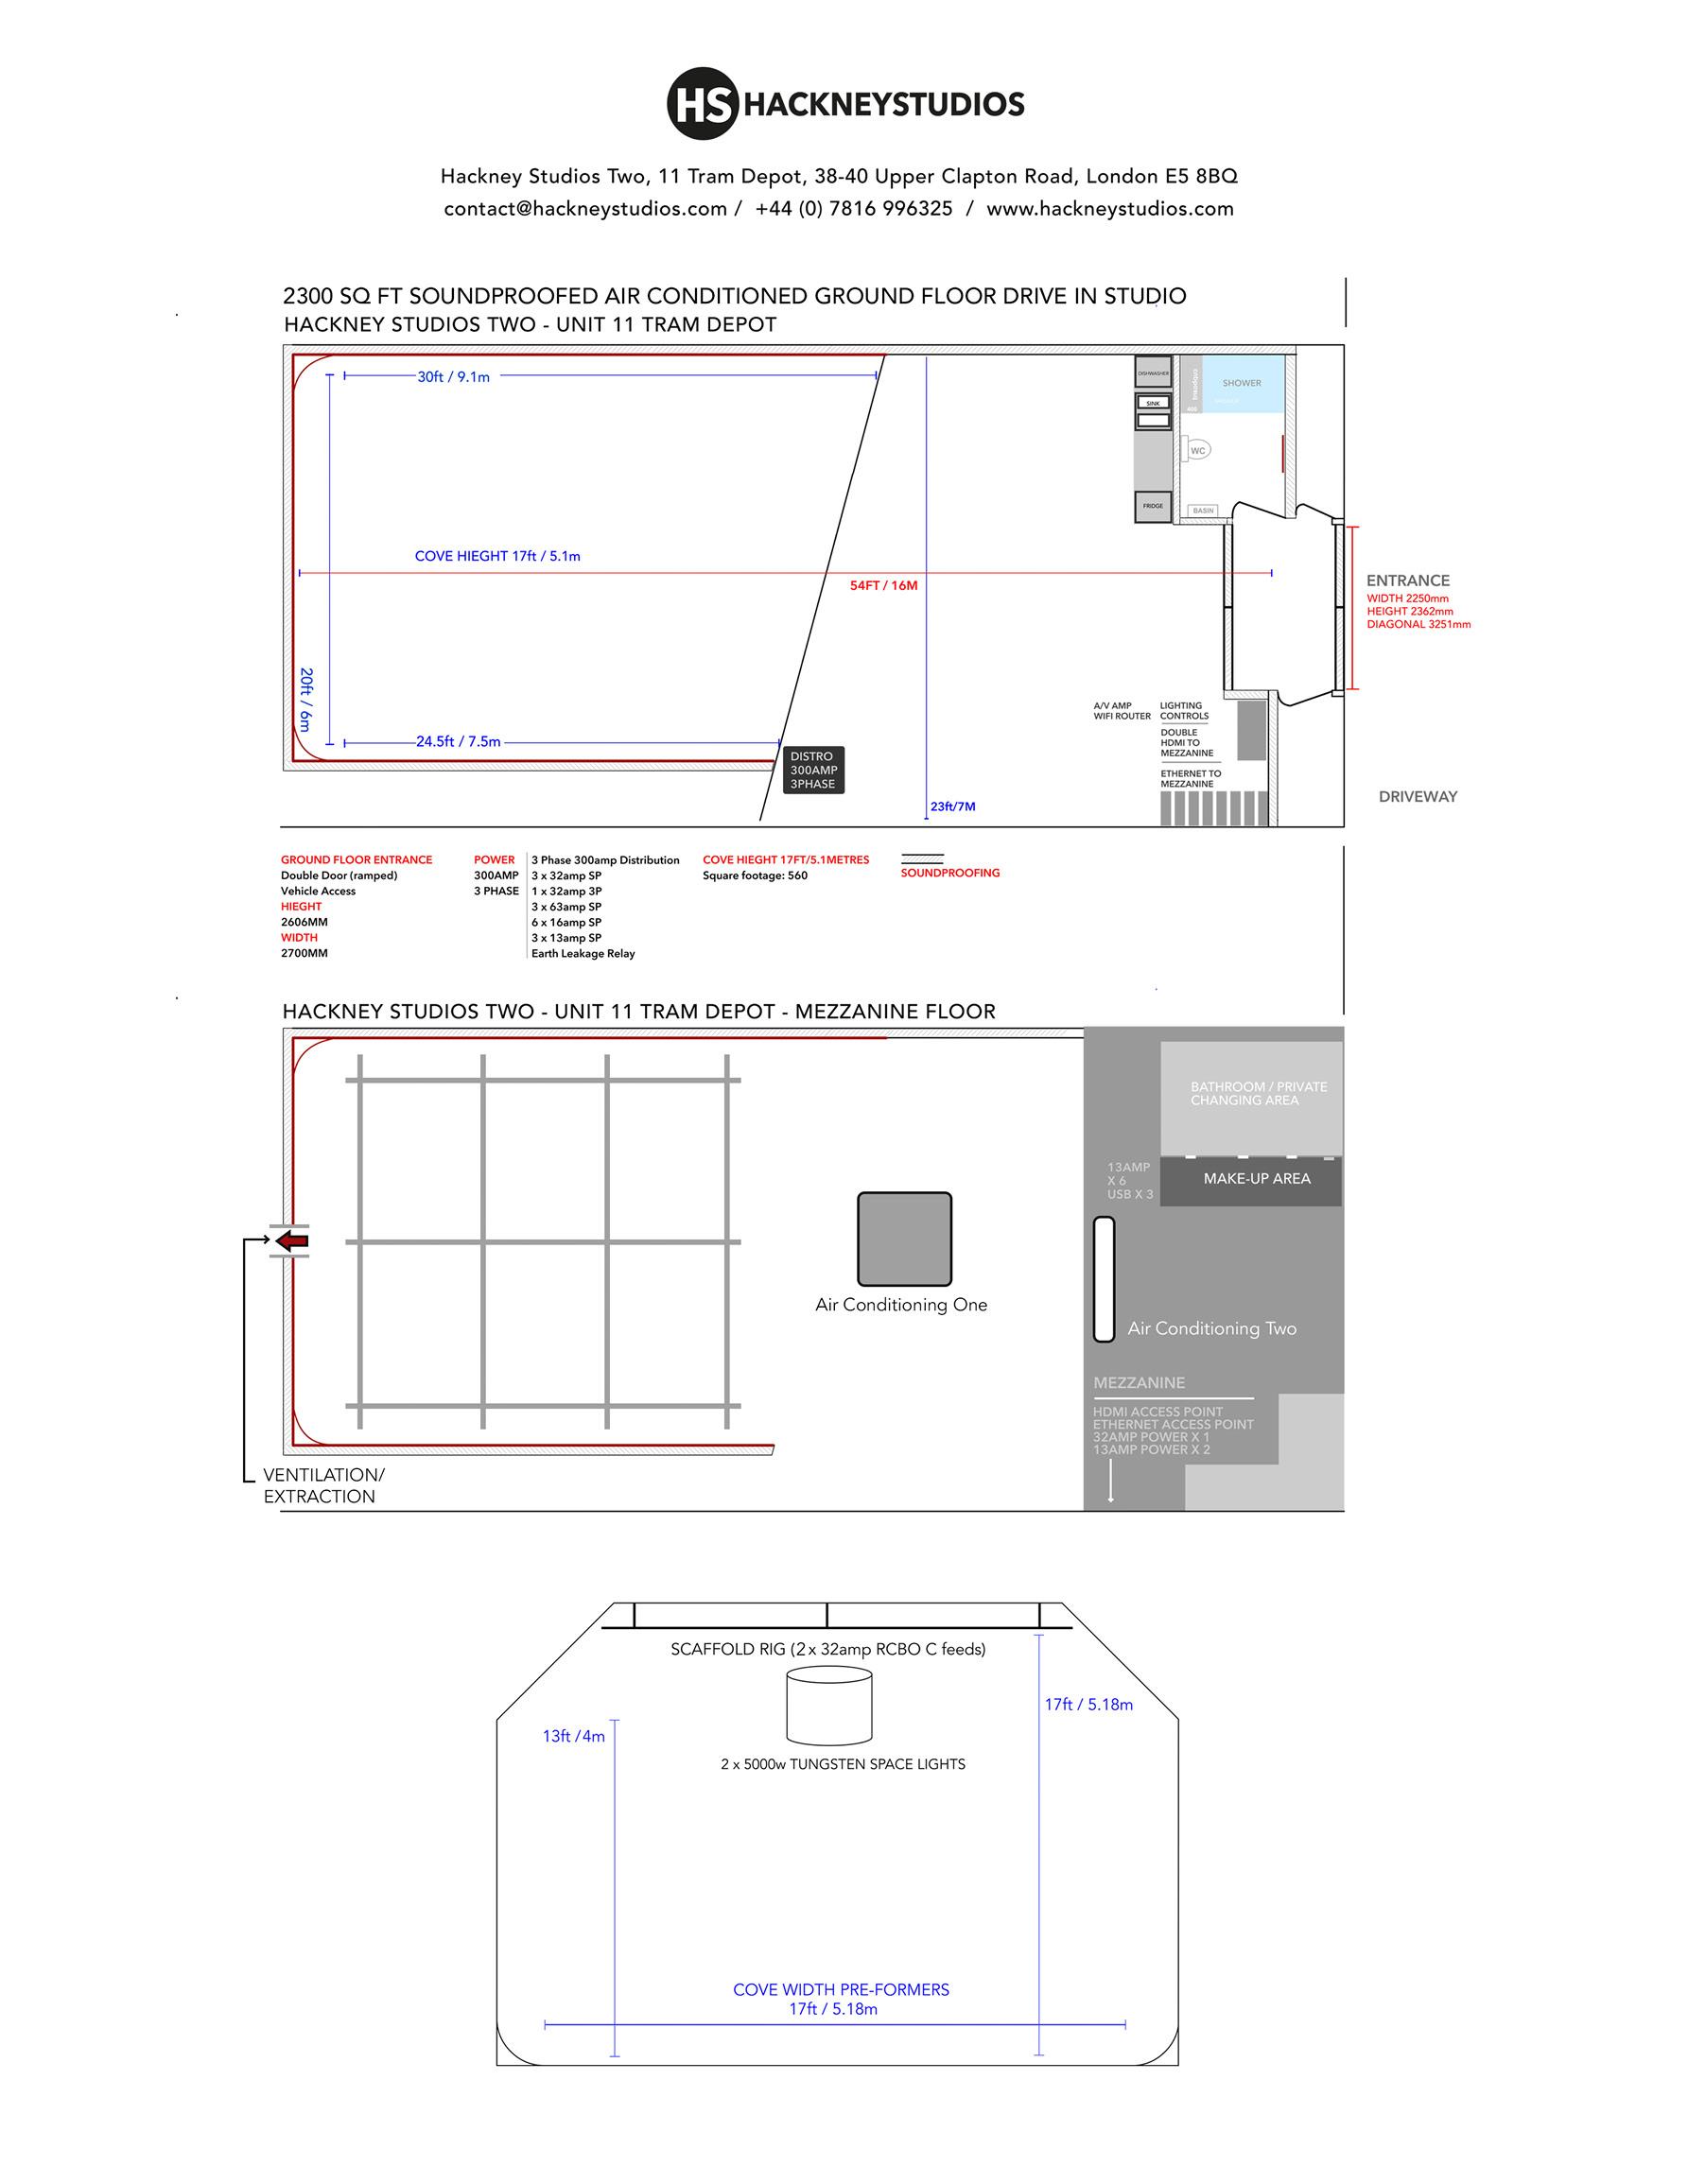 hackney_studios_two_plan_SITE